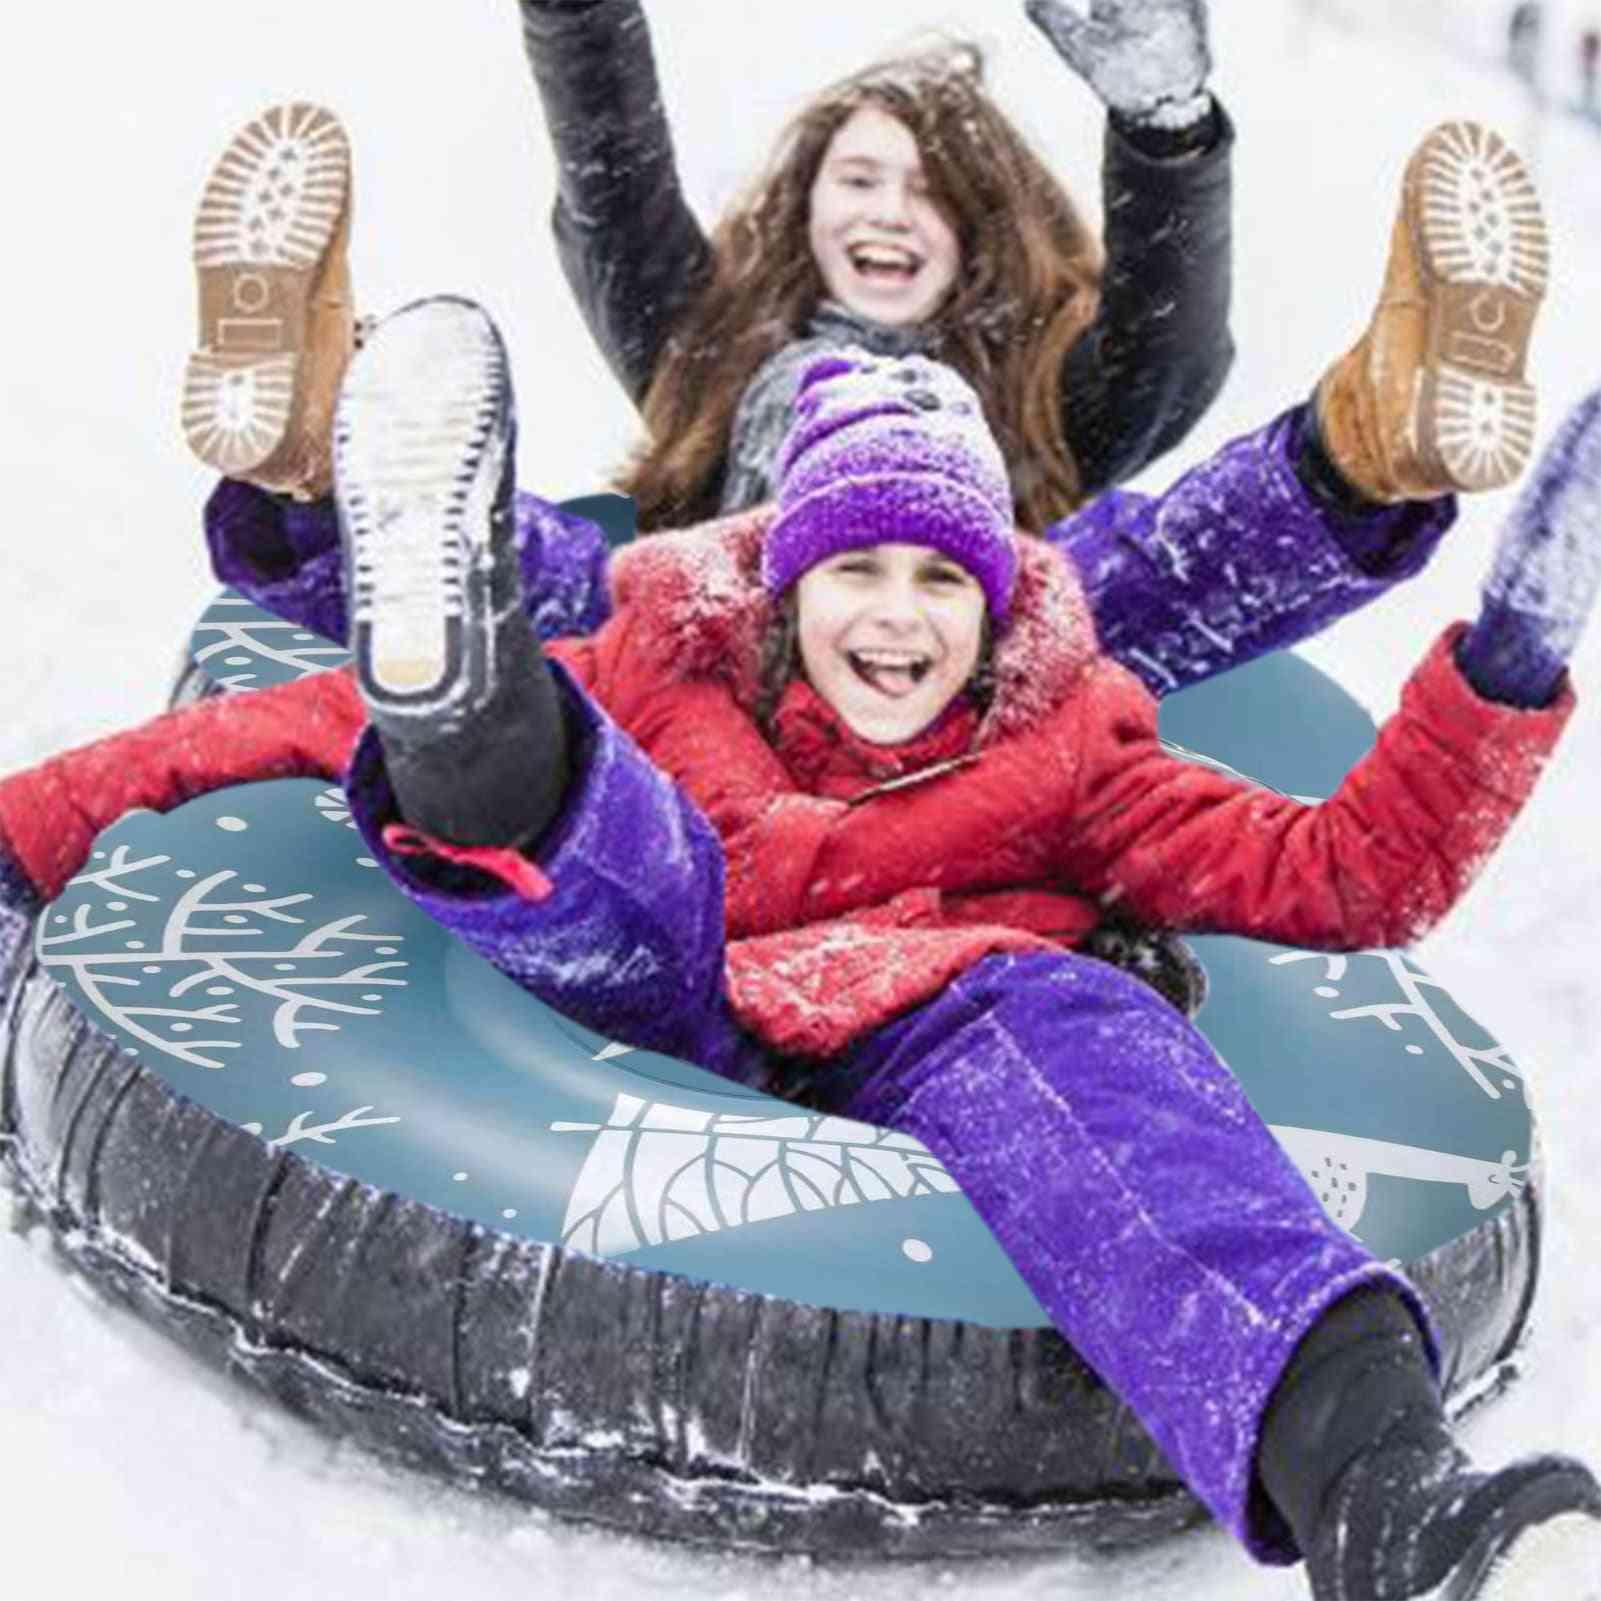 Ski Circle Adult Ski Ring Skiing Snow Tube Thickened Floated Sled